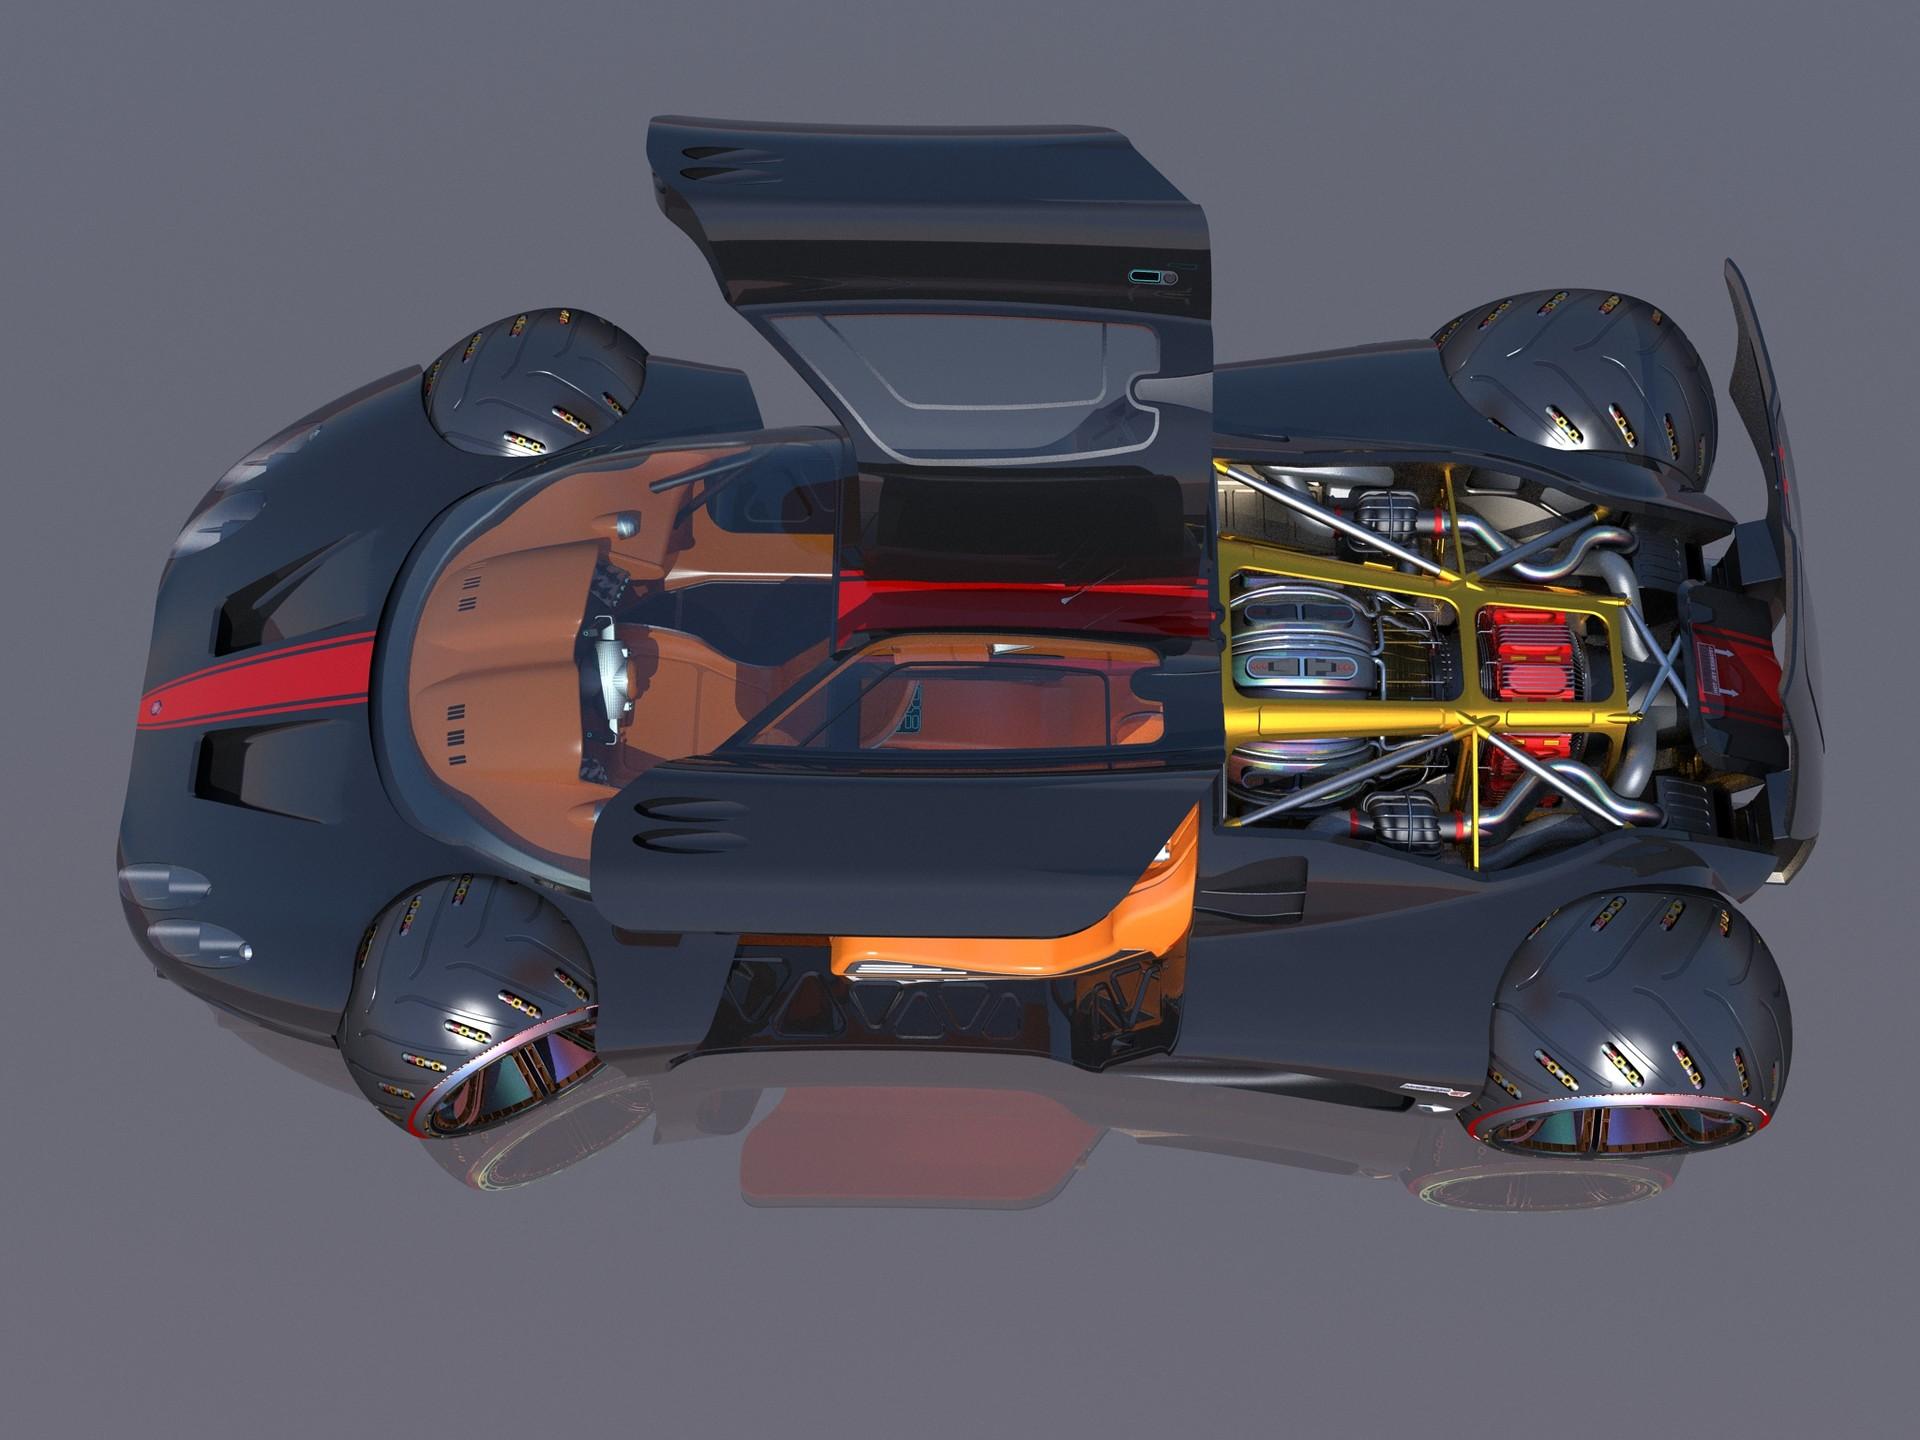 Joachim sverd supercar concept47doors open